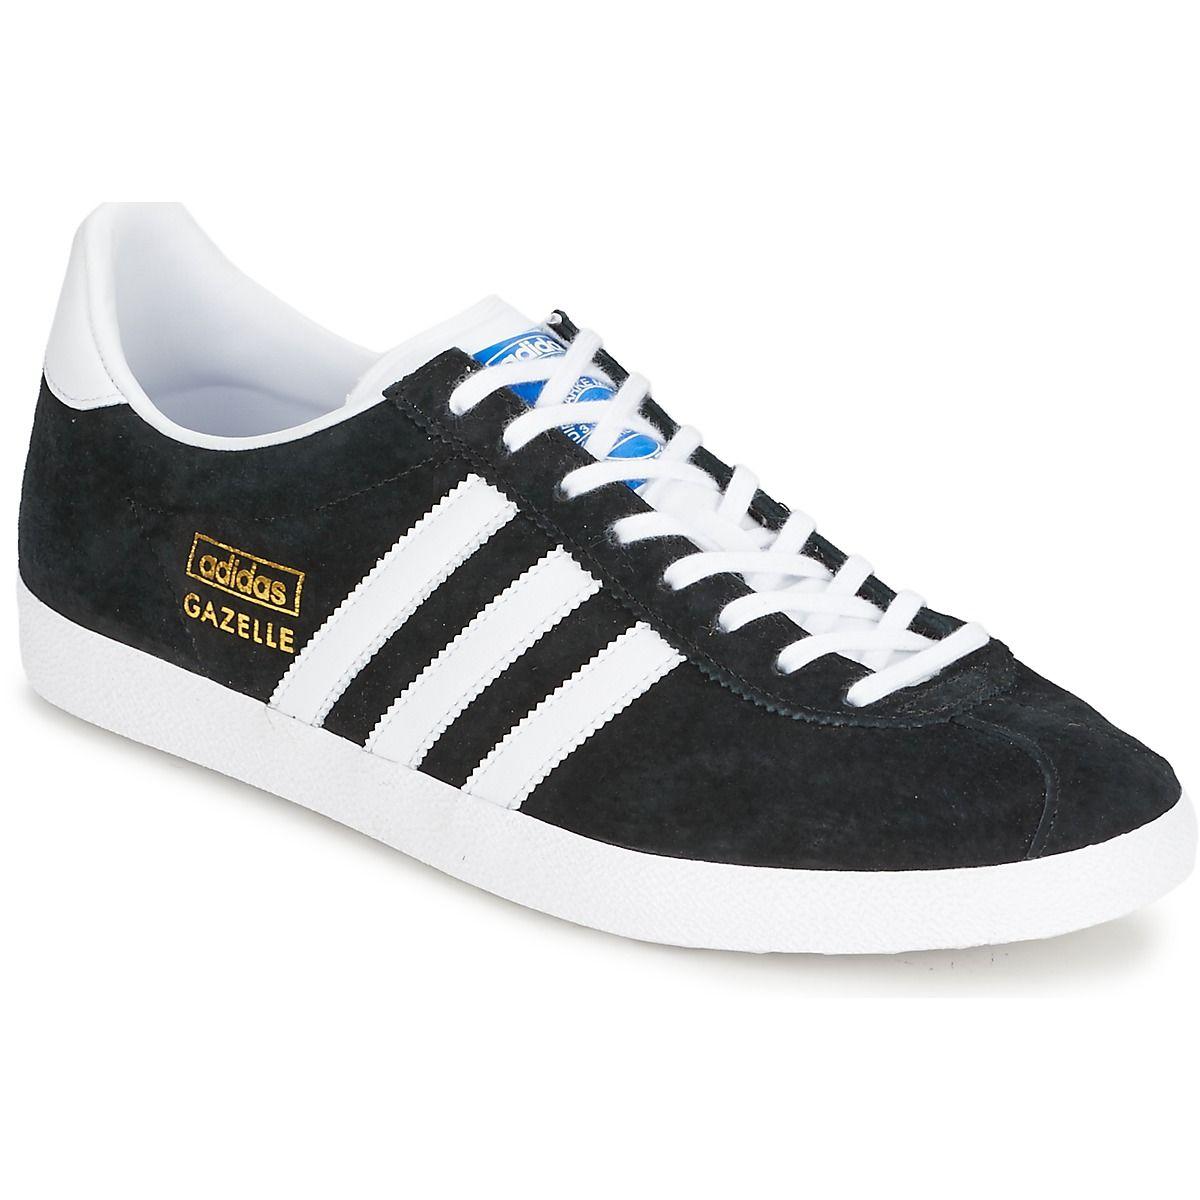 chaussure femme gazelle adidas